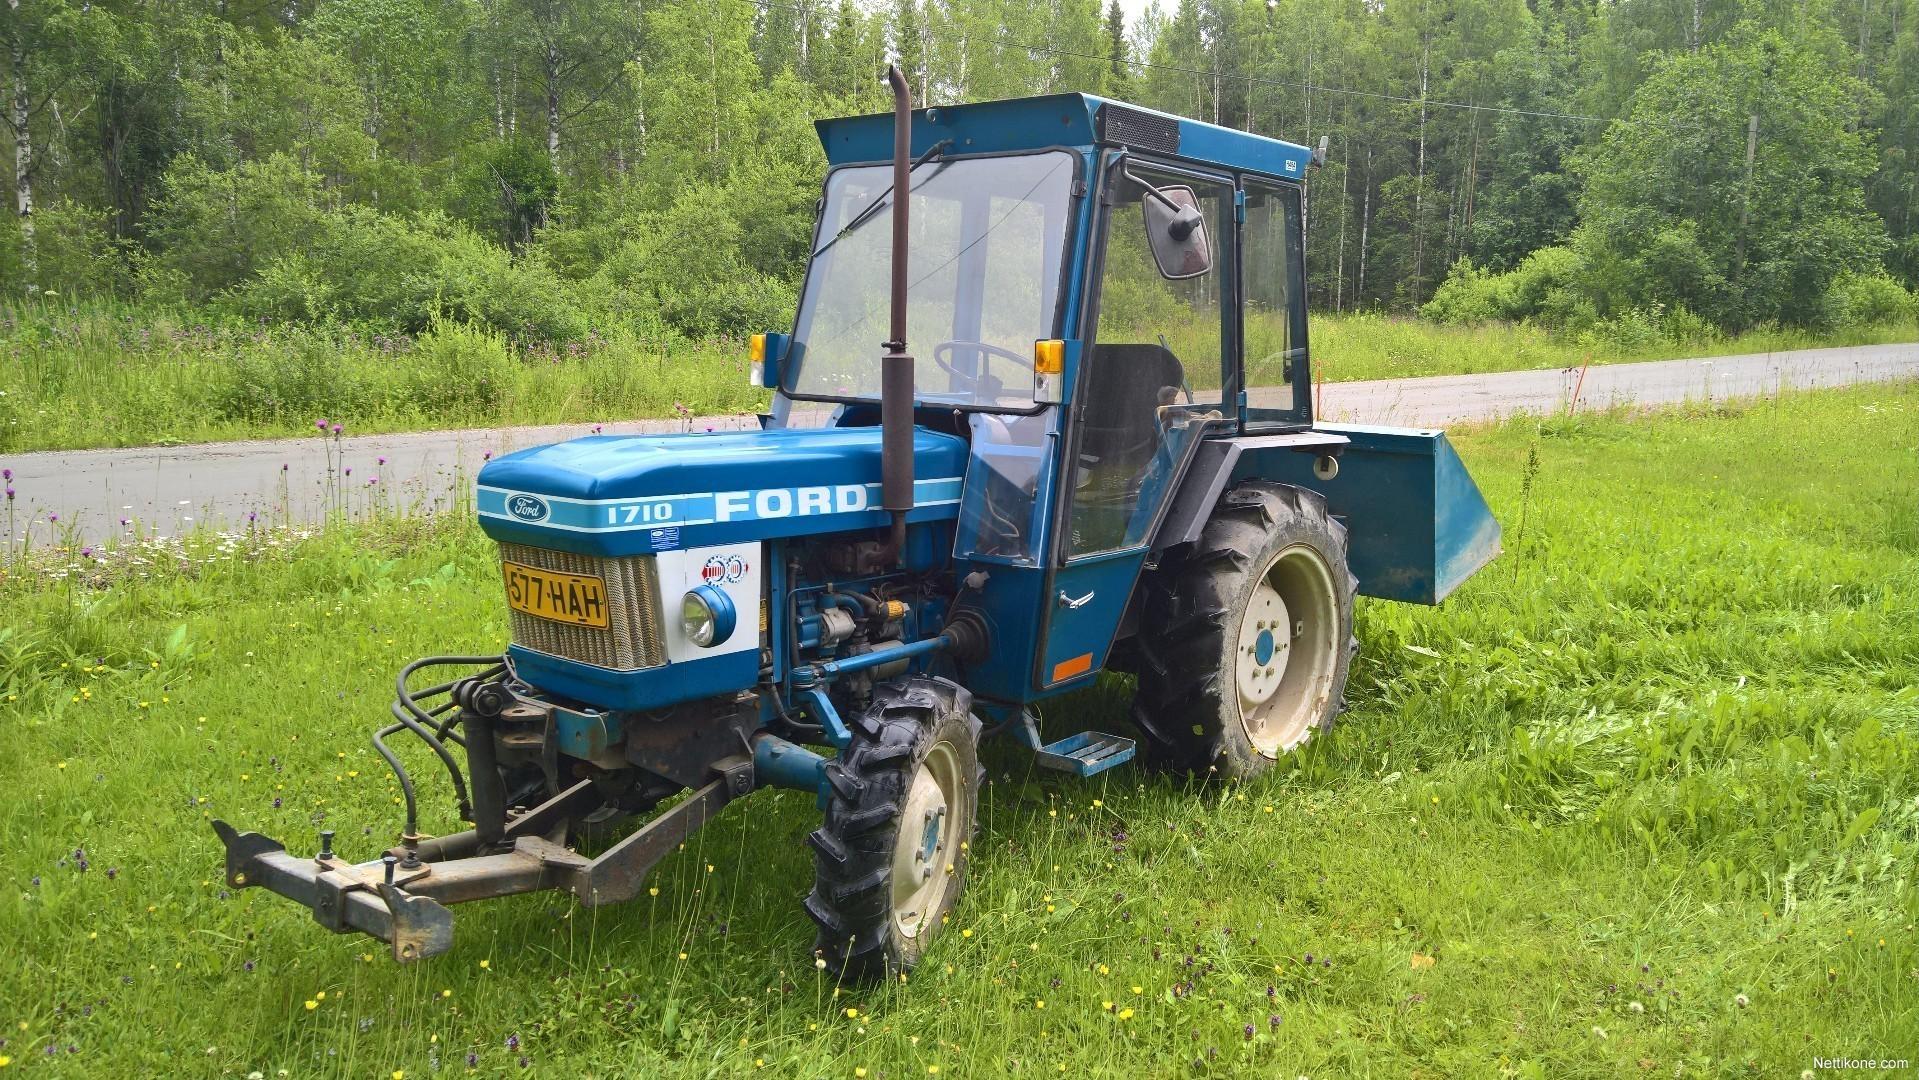 Ford 1710 Engine : Ford tractors nettikone